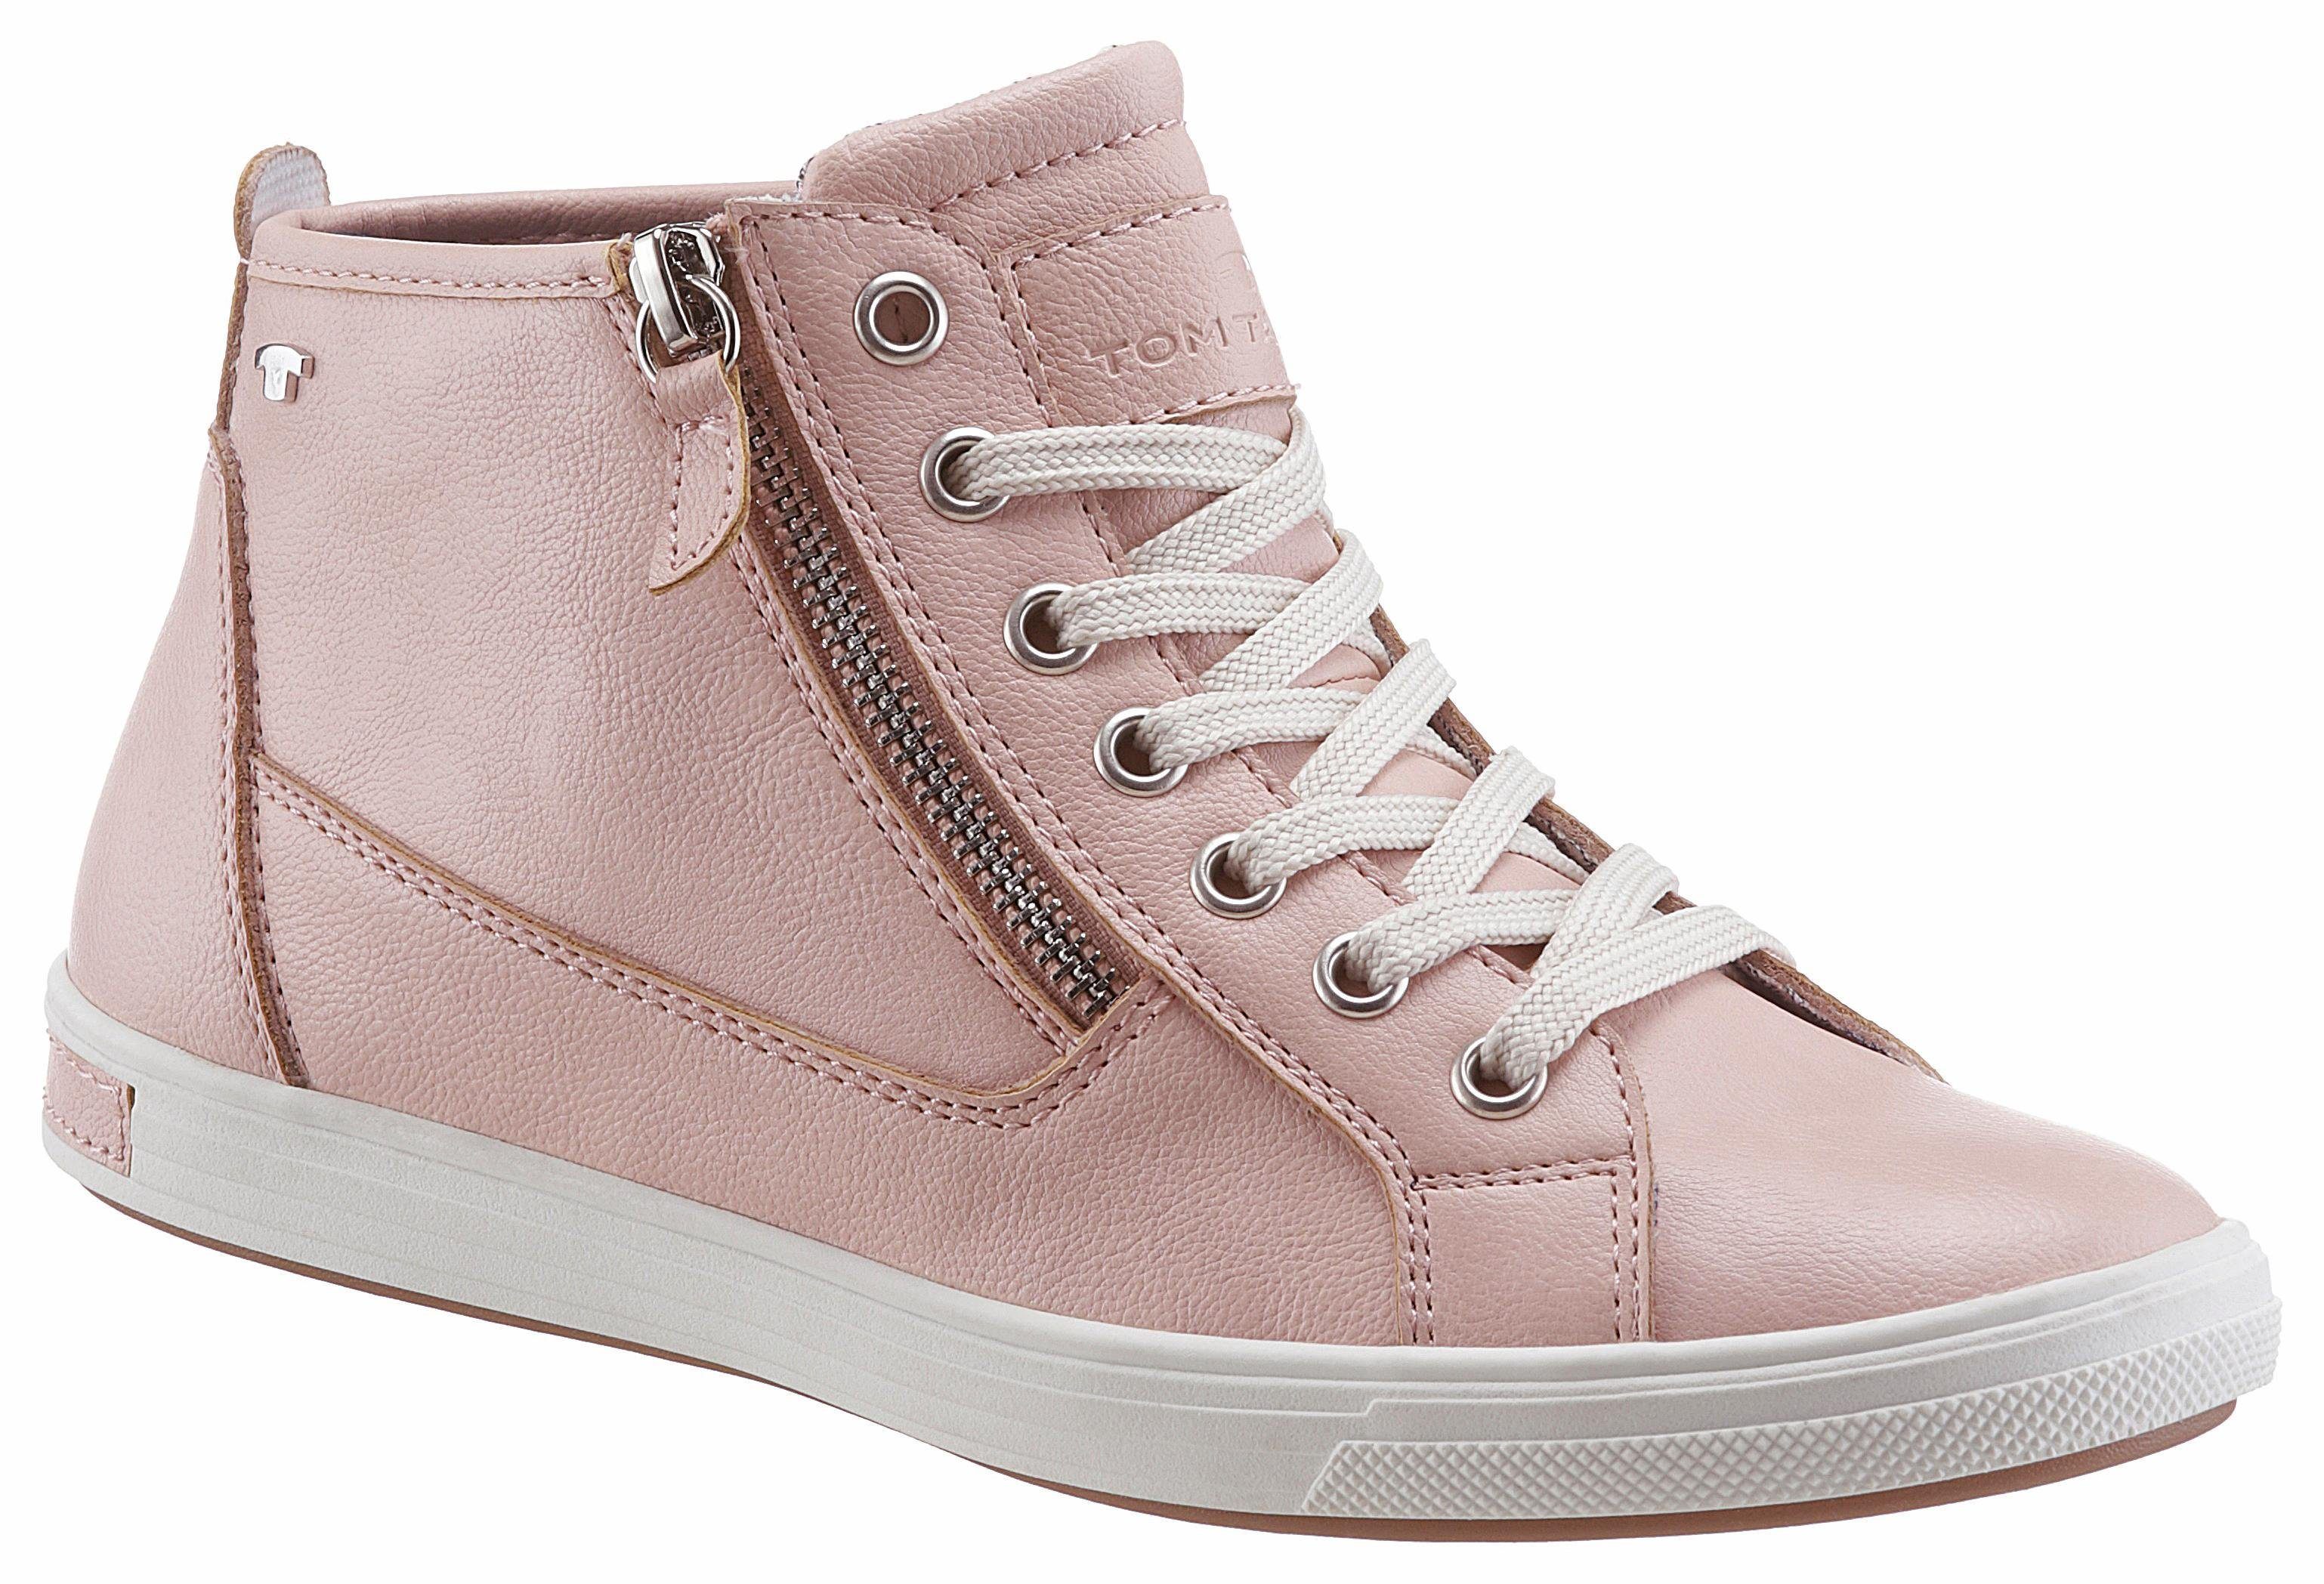 Marco Tozzi Sneaker, mit Metallic Effekt, rosa, EURO-Größen, rosé